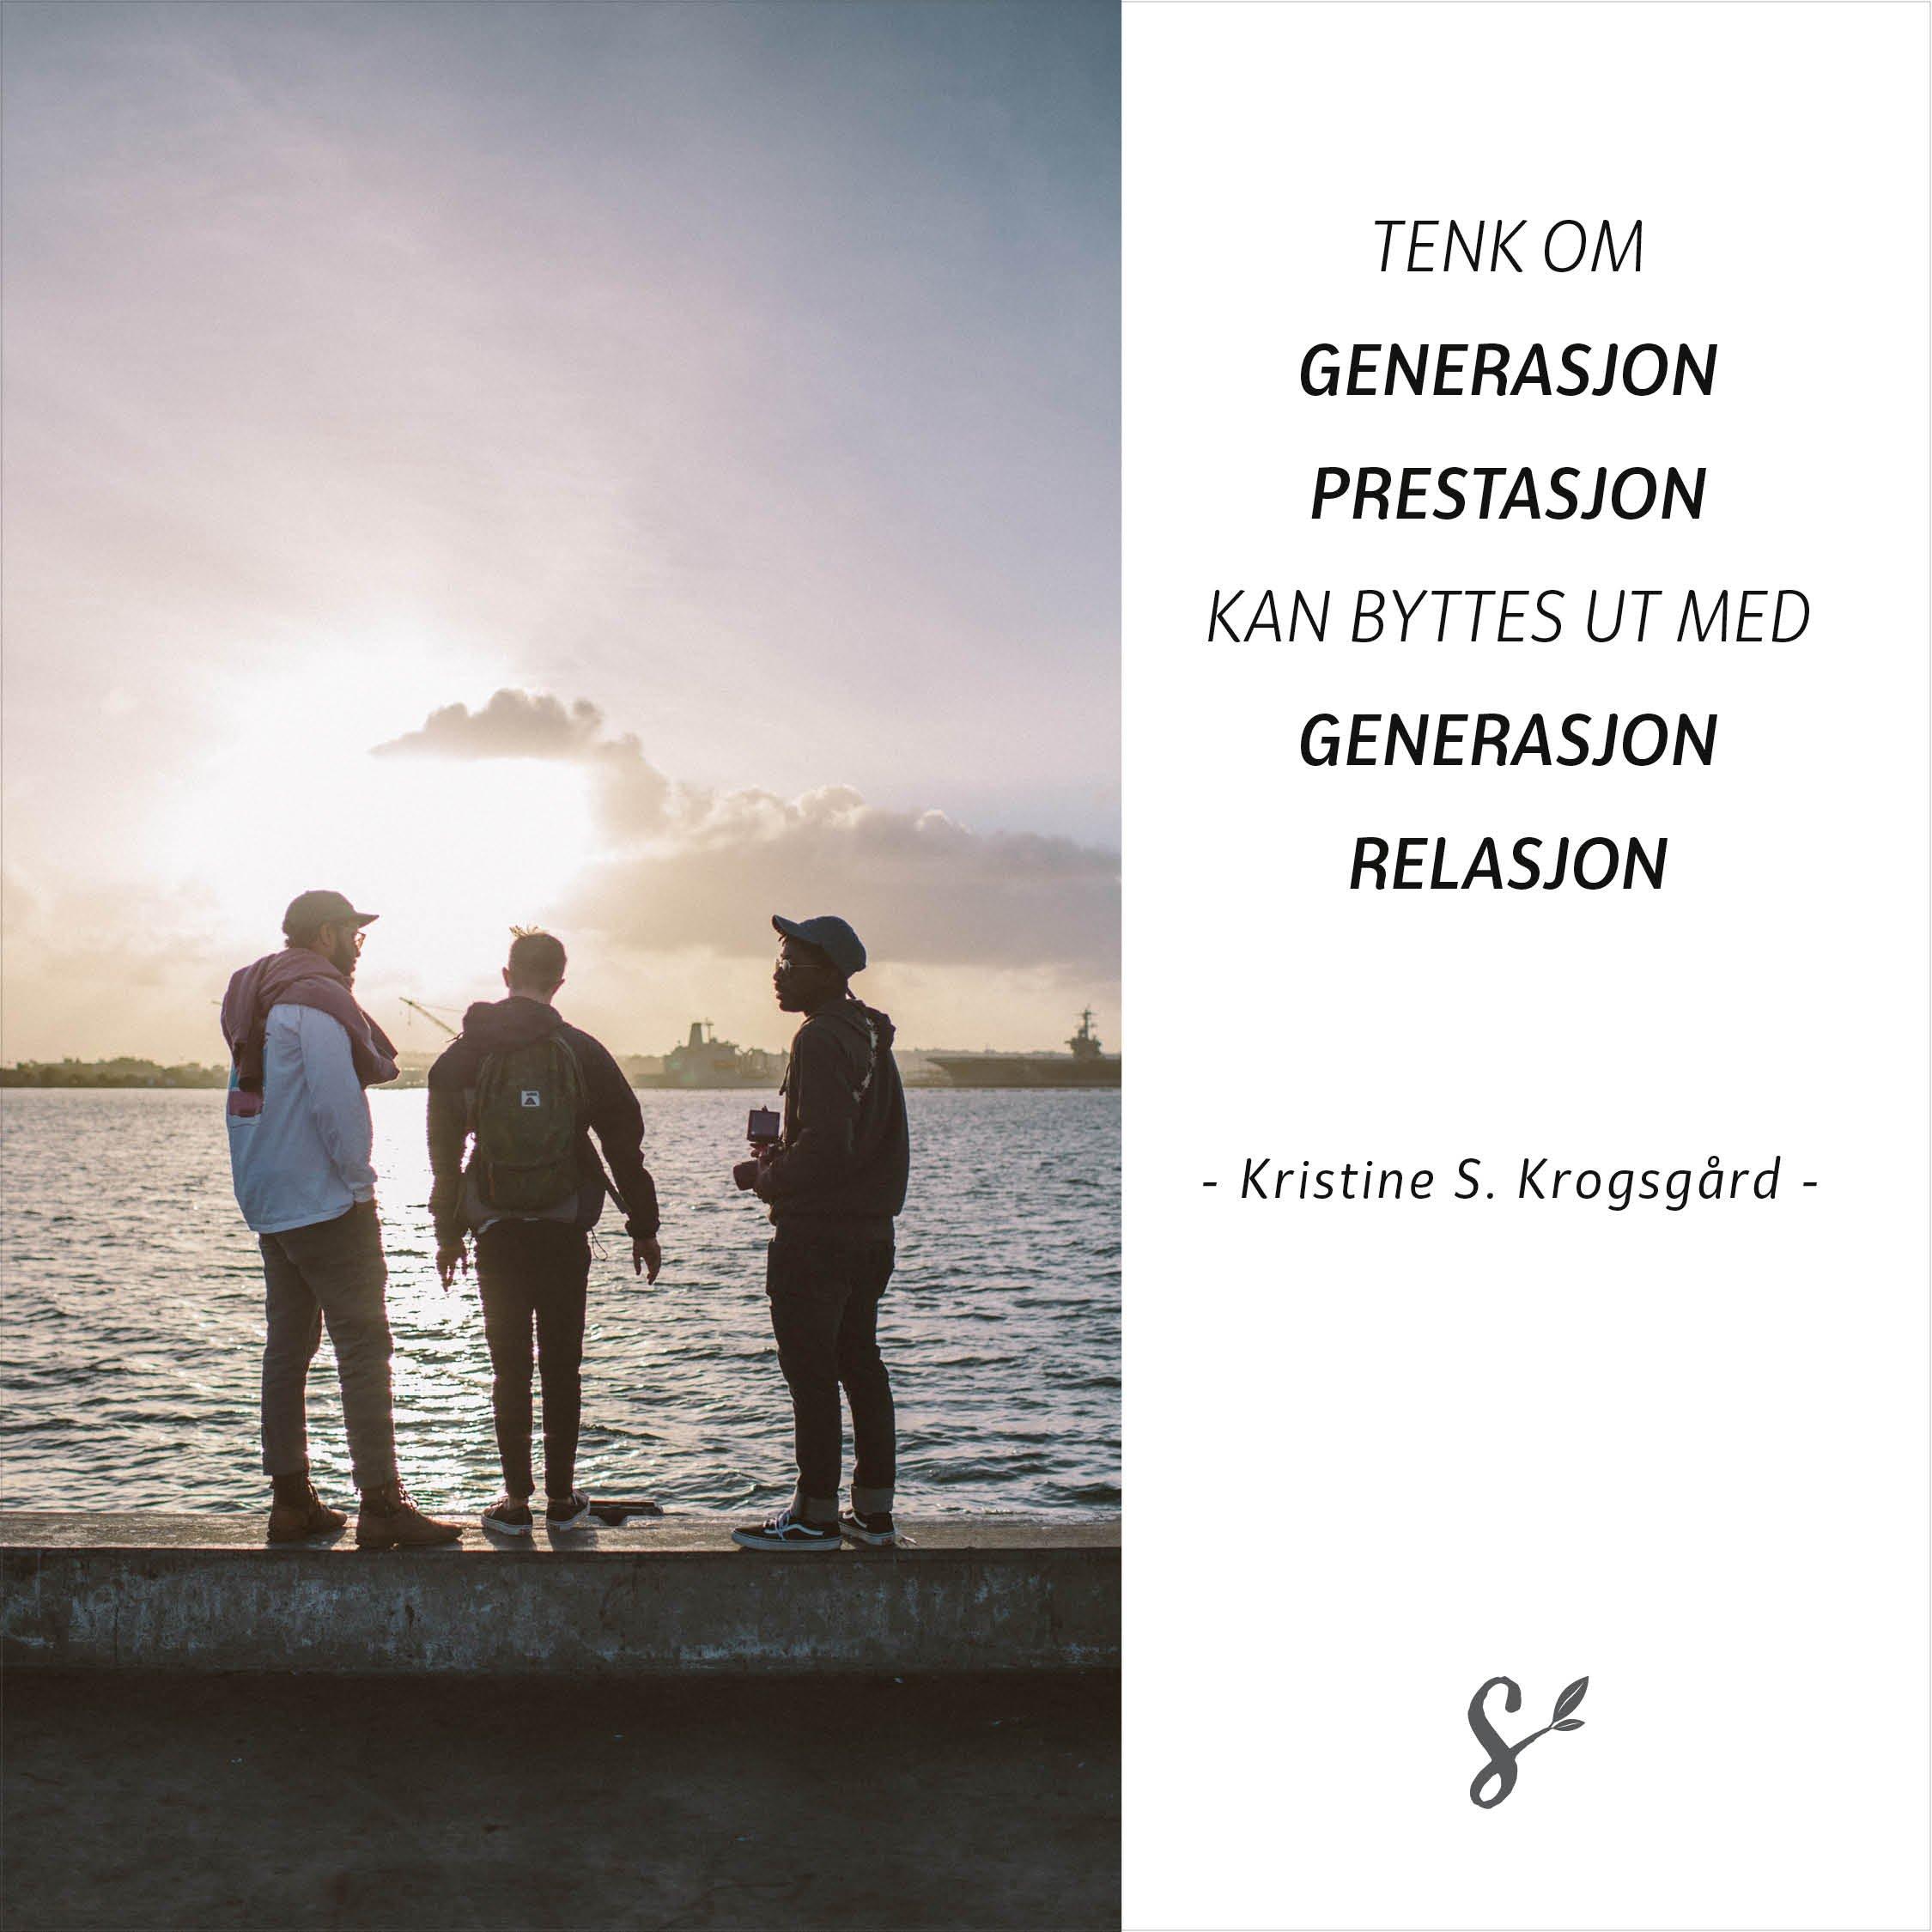 Generasjon prestasjon - sitatbilde